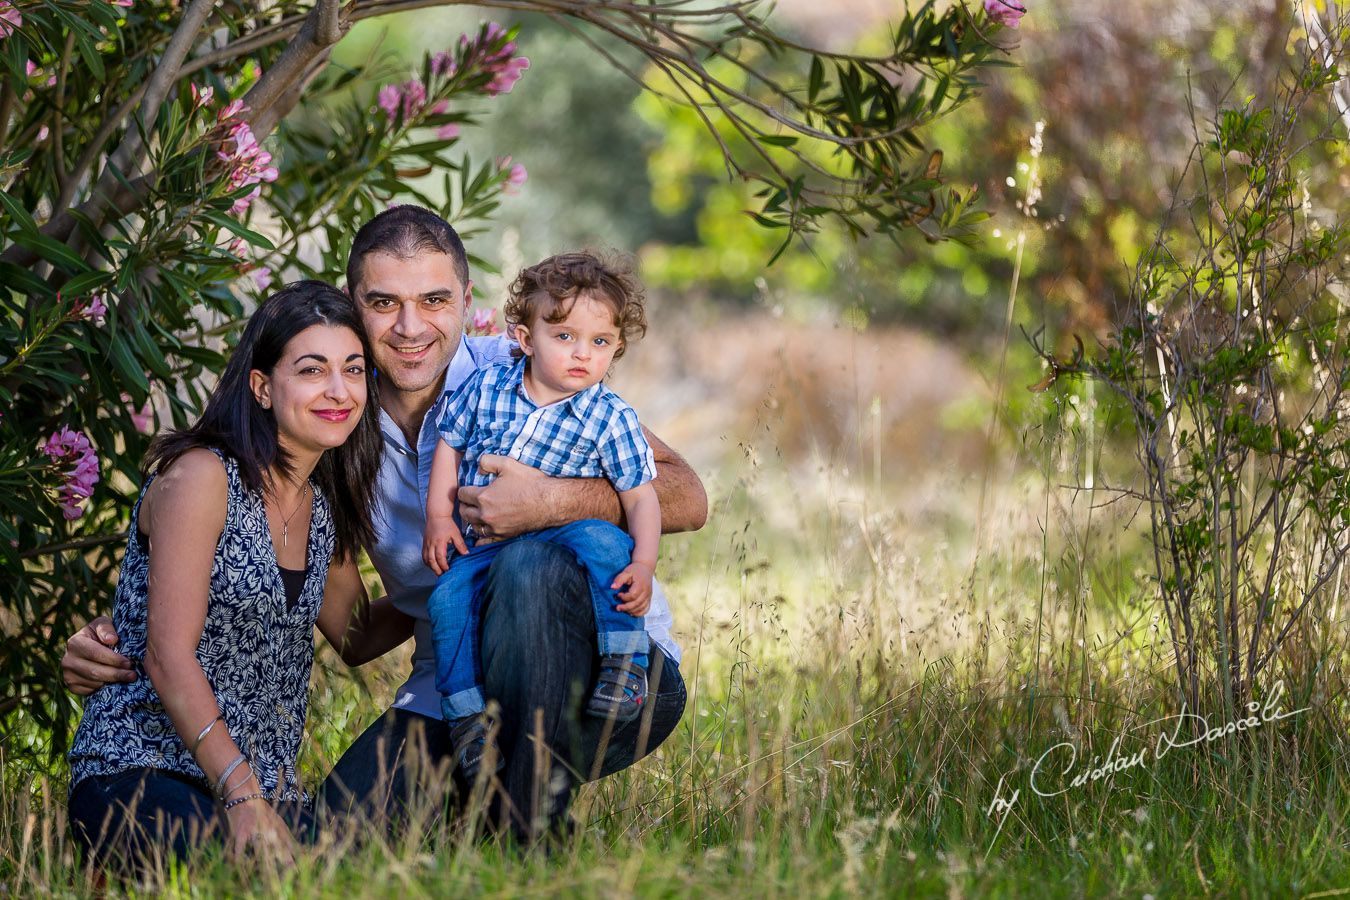 Maria, George & Harry - Family photo shoot near Curium Beach, Cyprus: Photographer: Cristian Dascalu